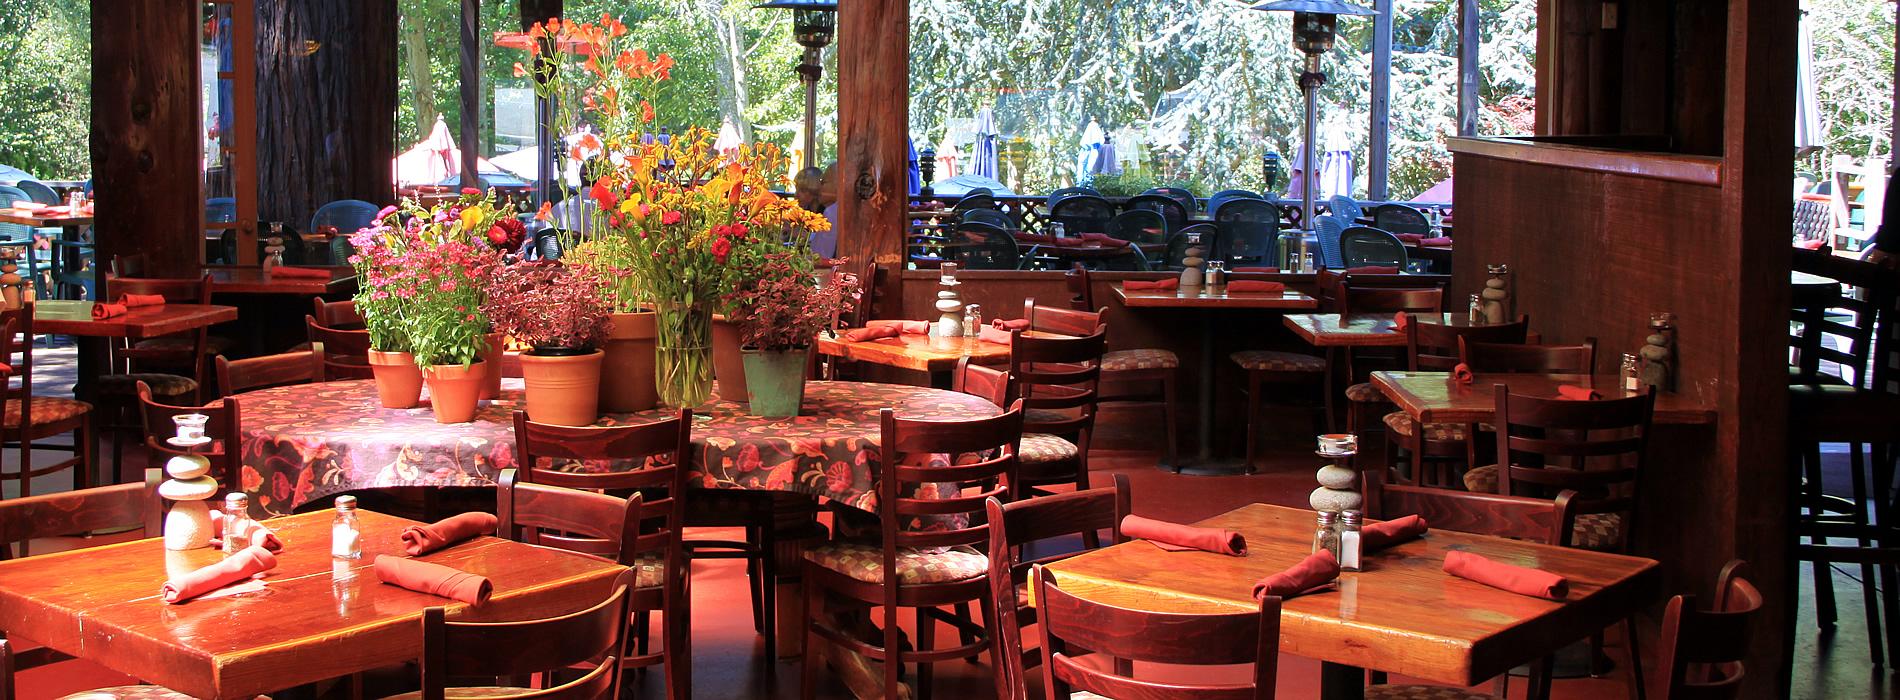 big-sur-river-inn-big-sur-california-restaurant